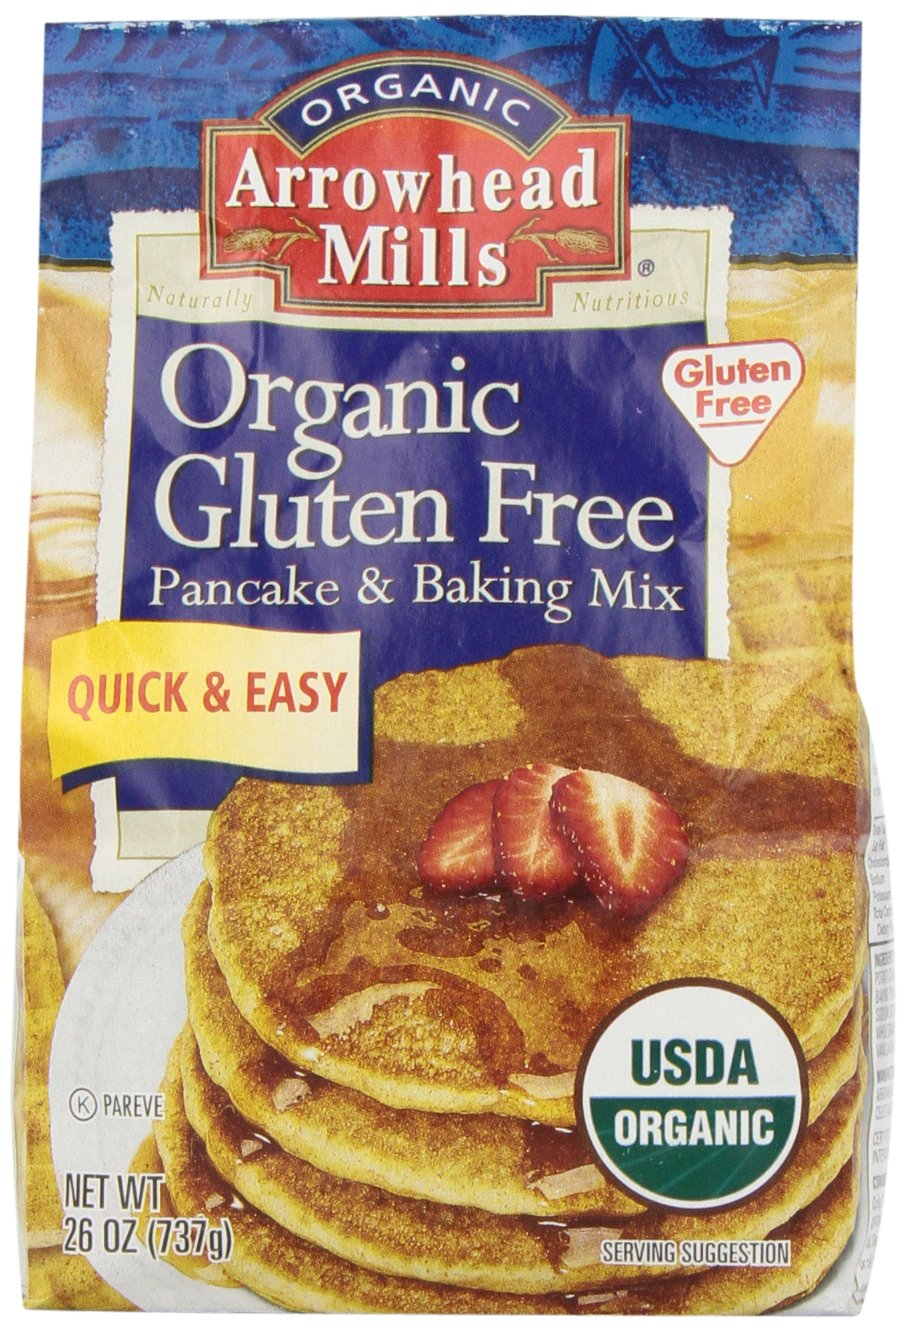 Arrowhead Mills Organic Gluten-Free Pancake & Baking Mix, 26 oz. by Arrowhead Mills